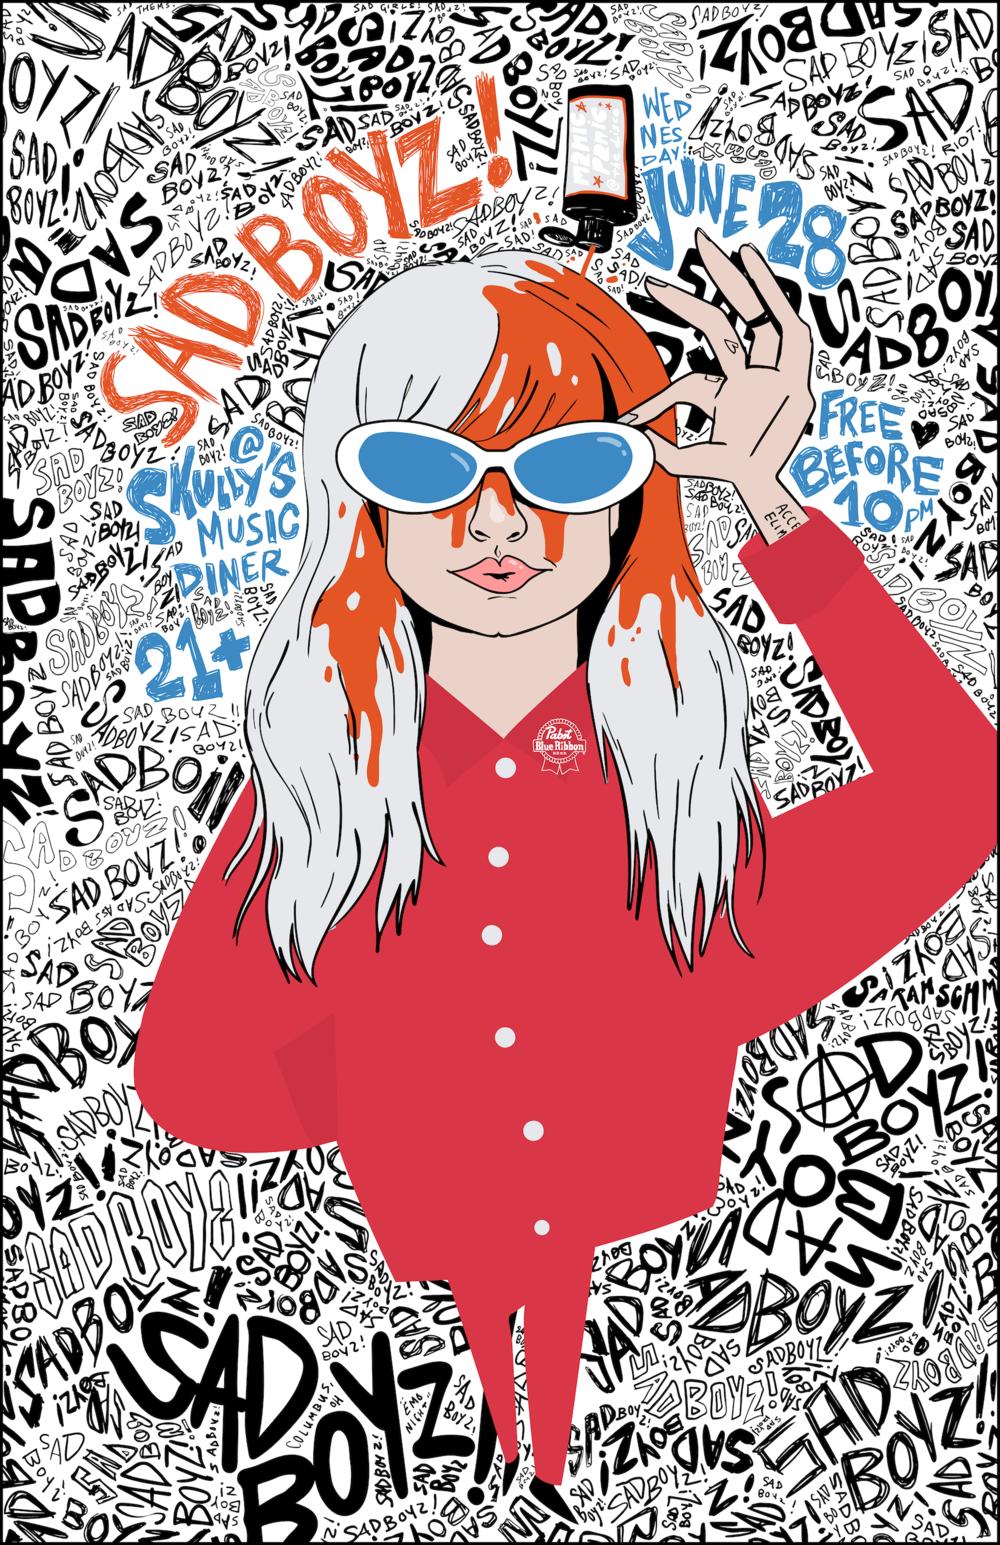 SadBoyzJune_poster_web_1650px.png